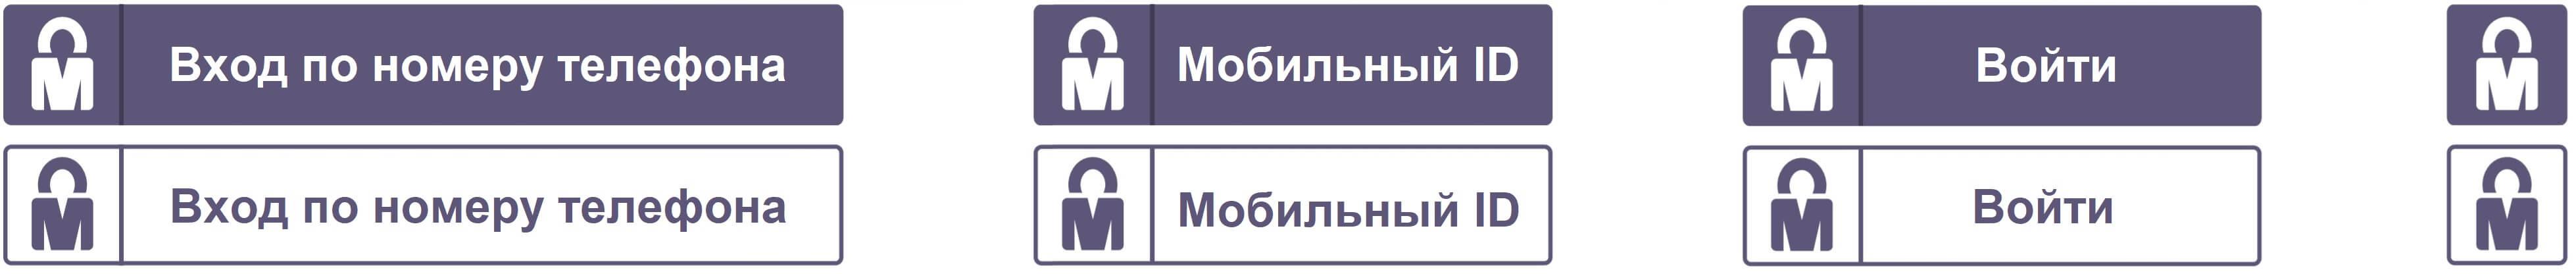 Mobile ID Мобильный ID Вход